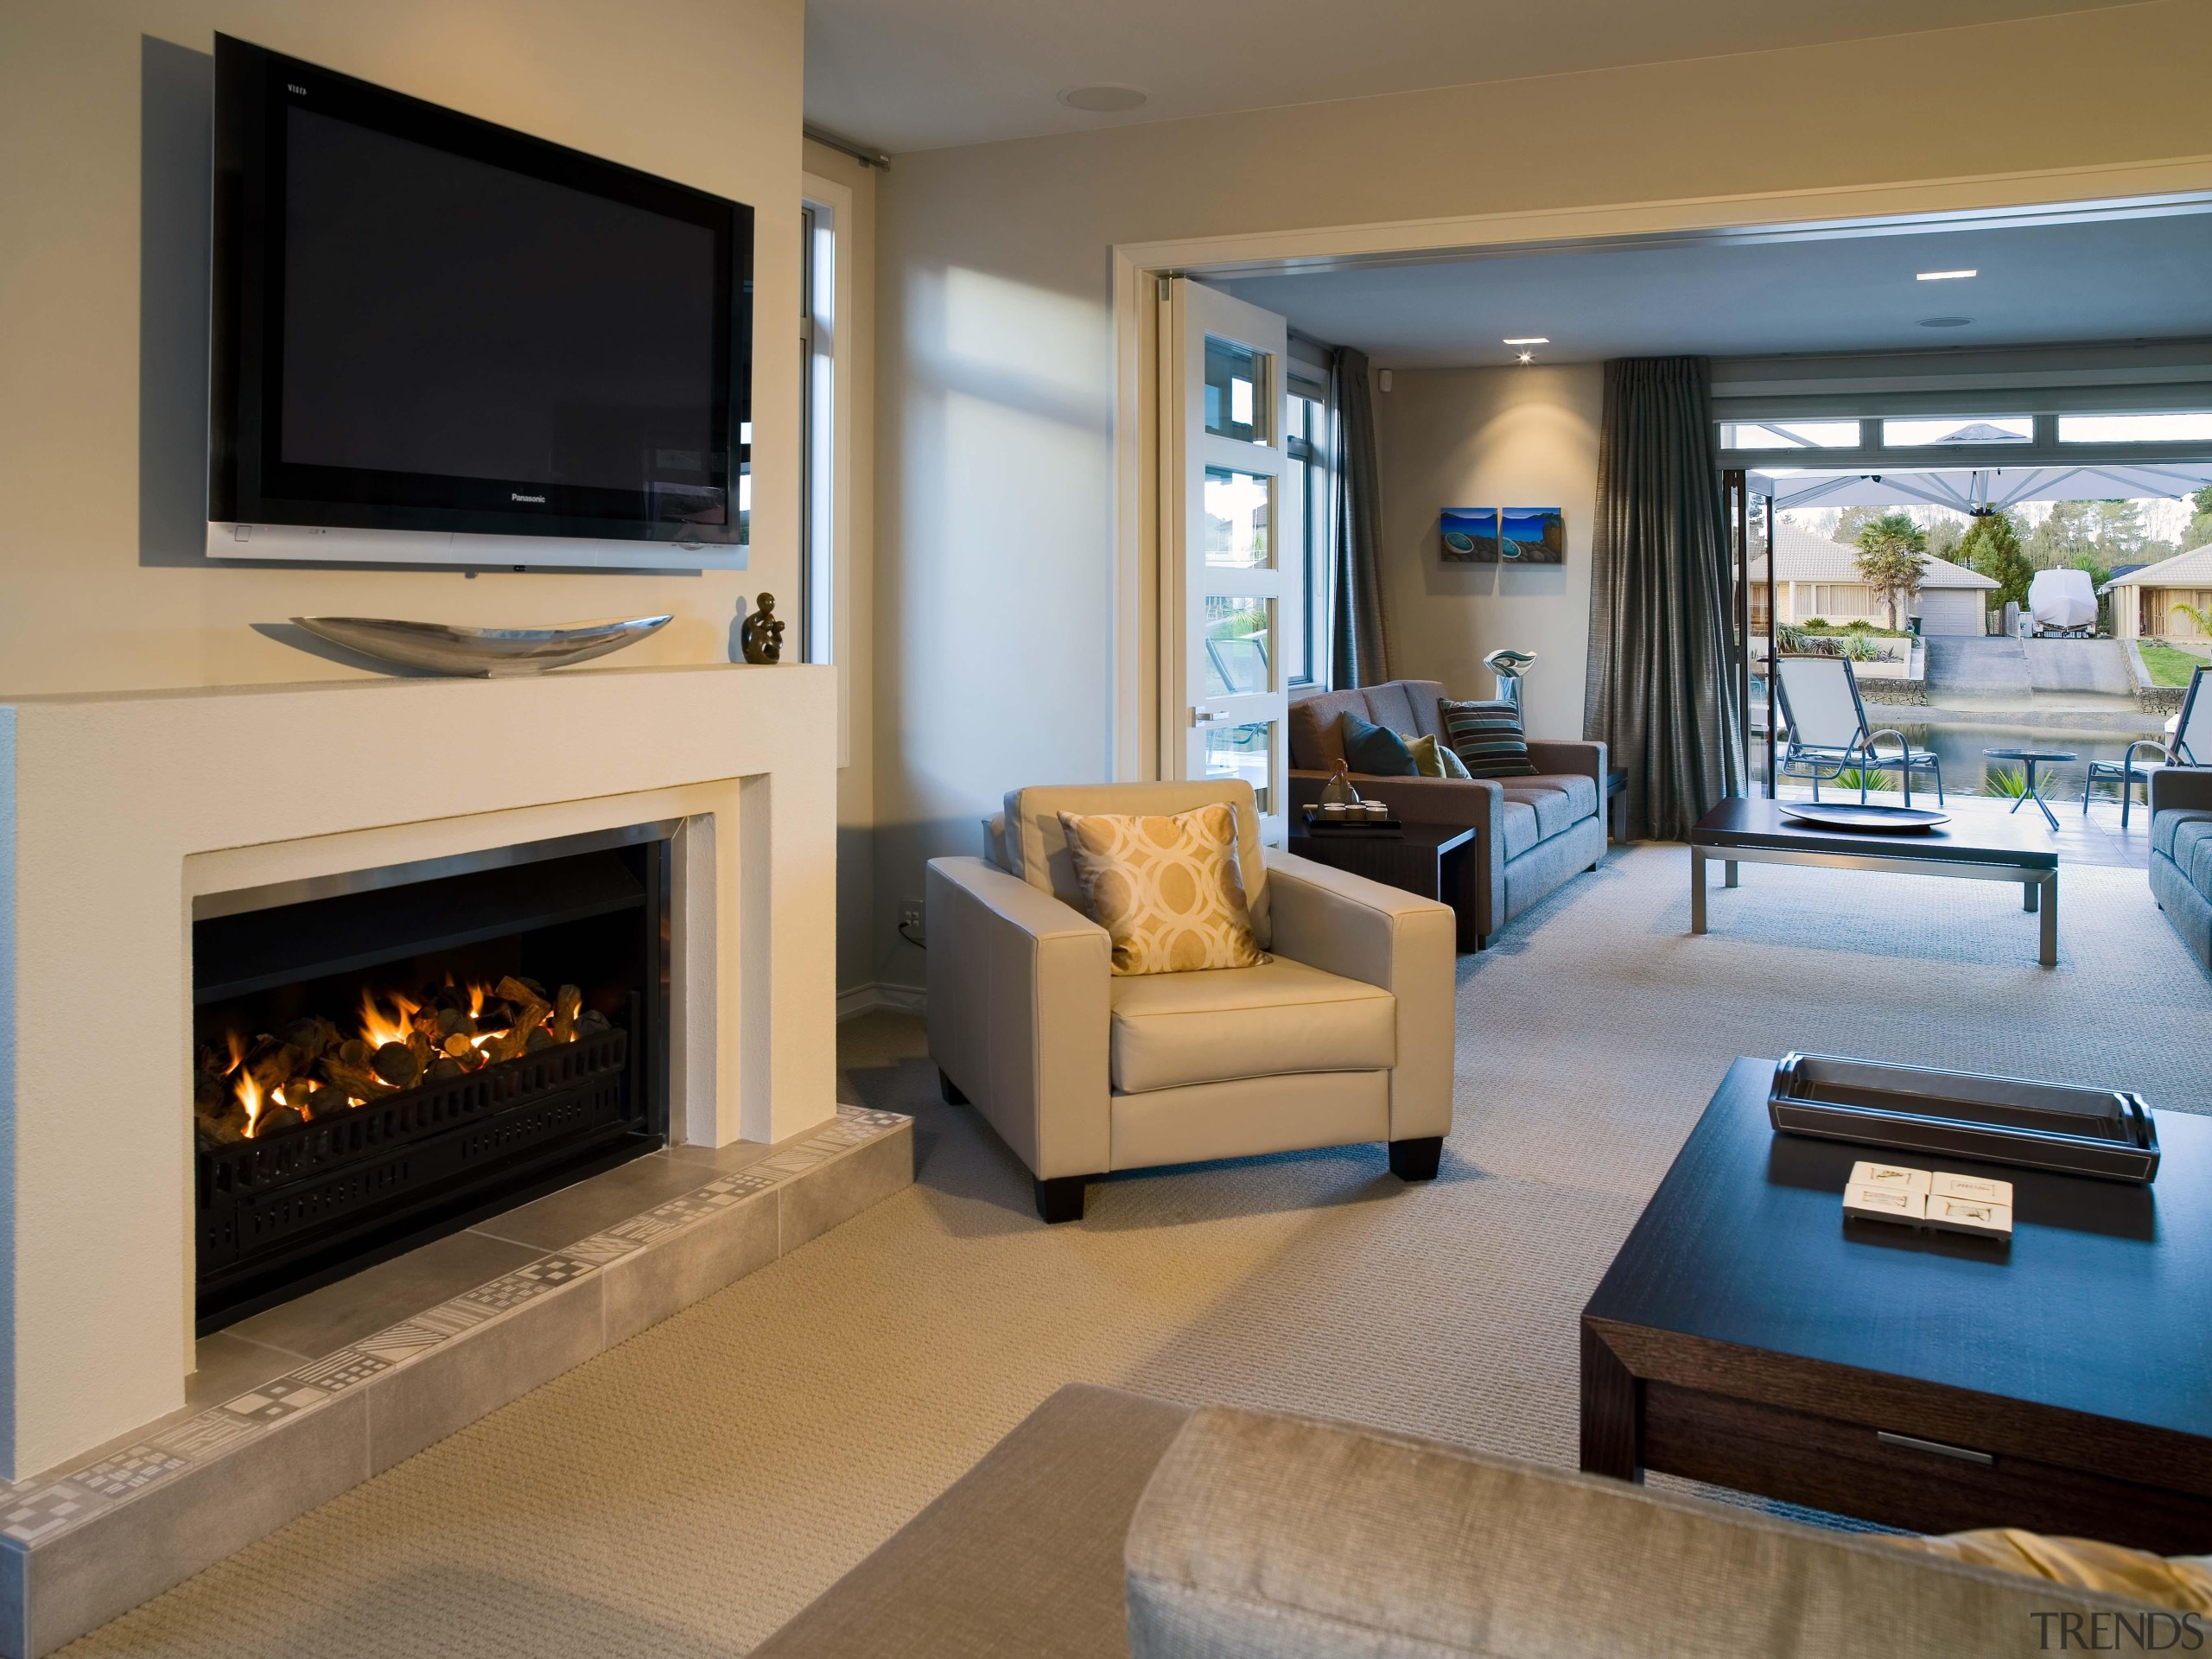 pauanui  lounge 2 - pauanui__lounge_2 - fireplace fireplace, floor, hearth, home, interior design, living room, property, real estate, room, brown